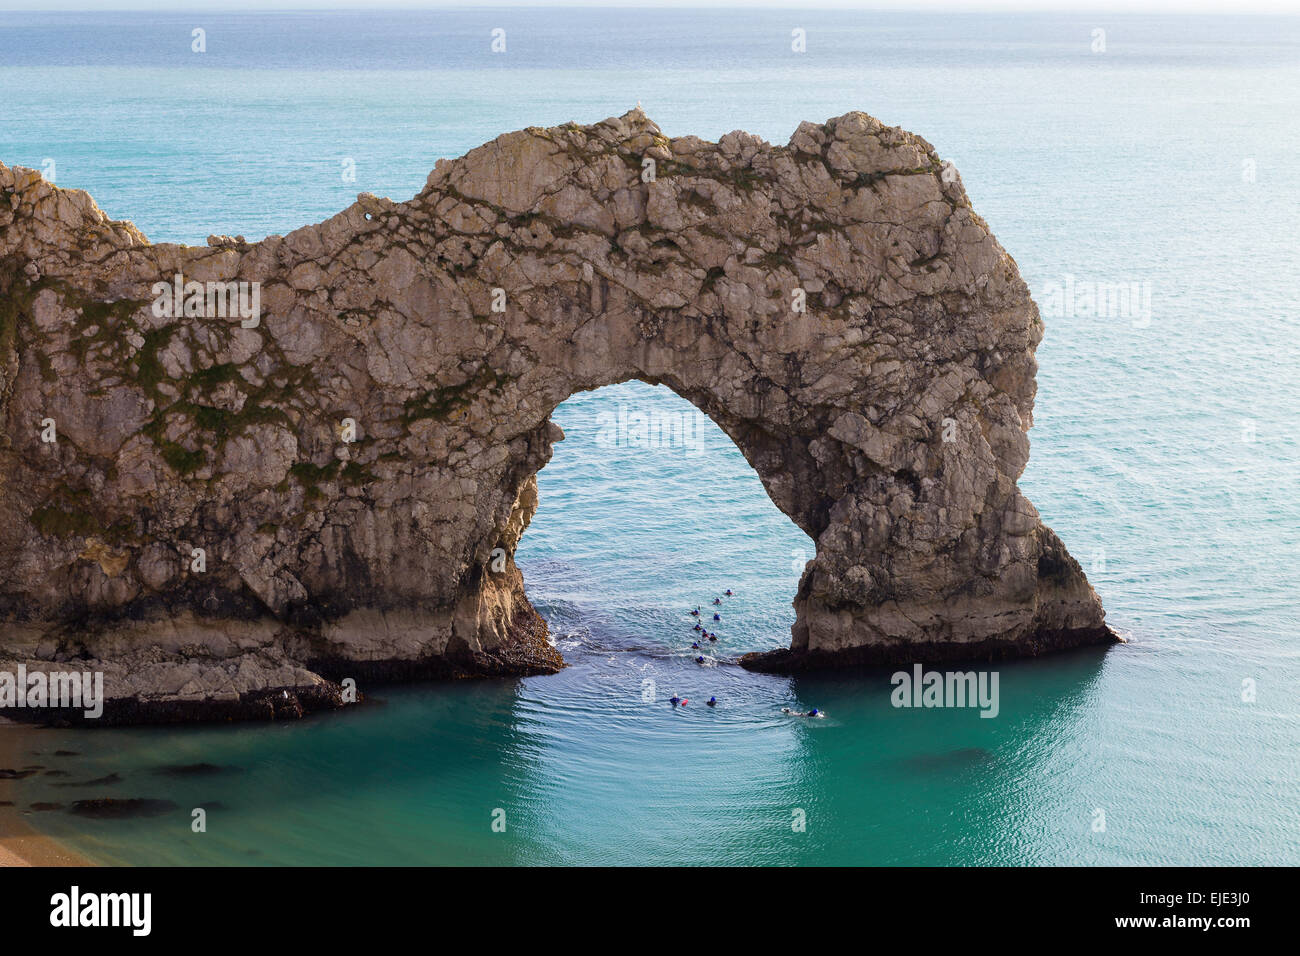 The Sea Arch At Durdle Door On The Jurassic Coast In Dorset On A Calm Sunny Day. Swimmers Swim Through The Arch & Durdle Door Arch u0026 Download Durdle Door Sea Arch Dorset Stock ... pezcame.com